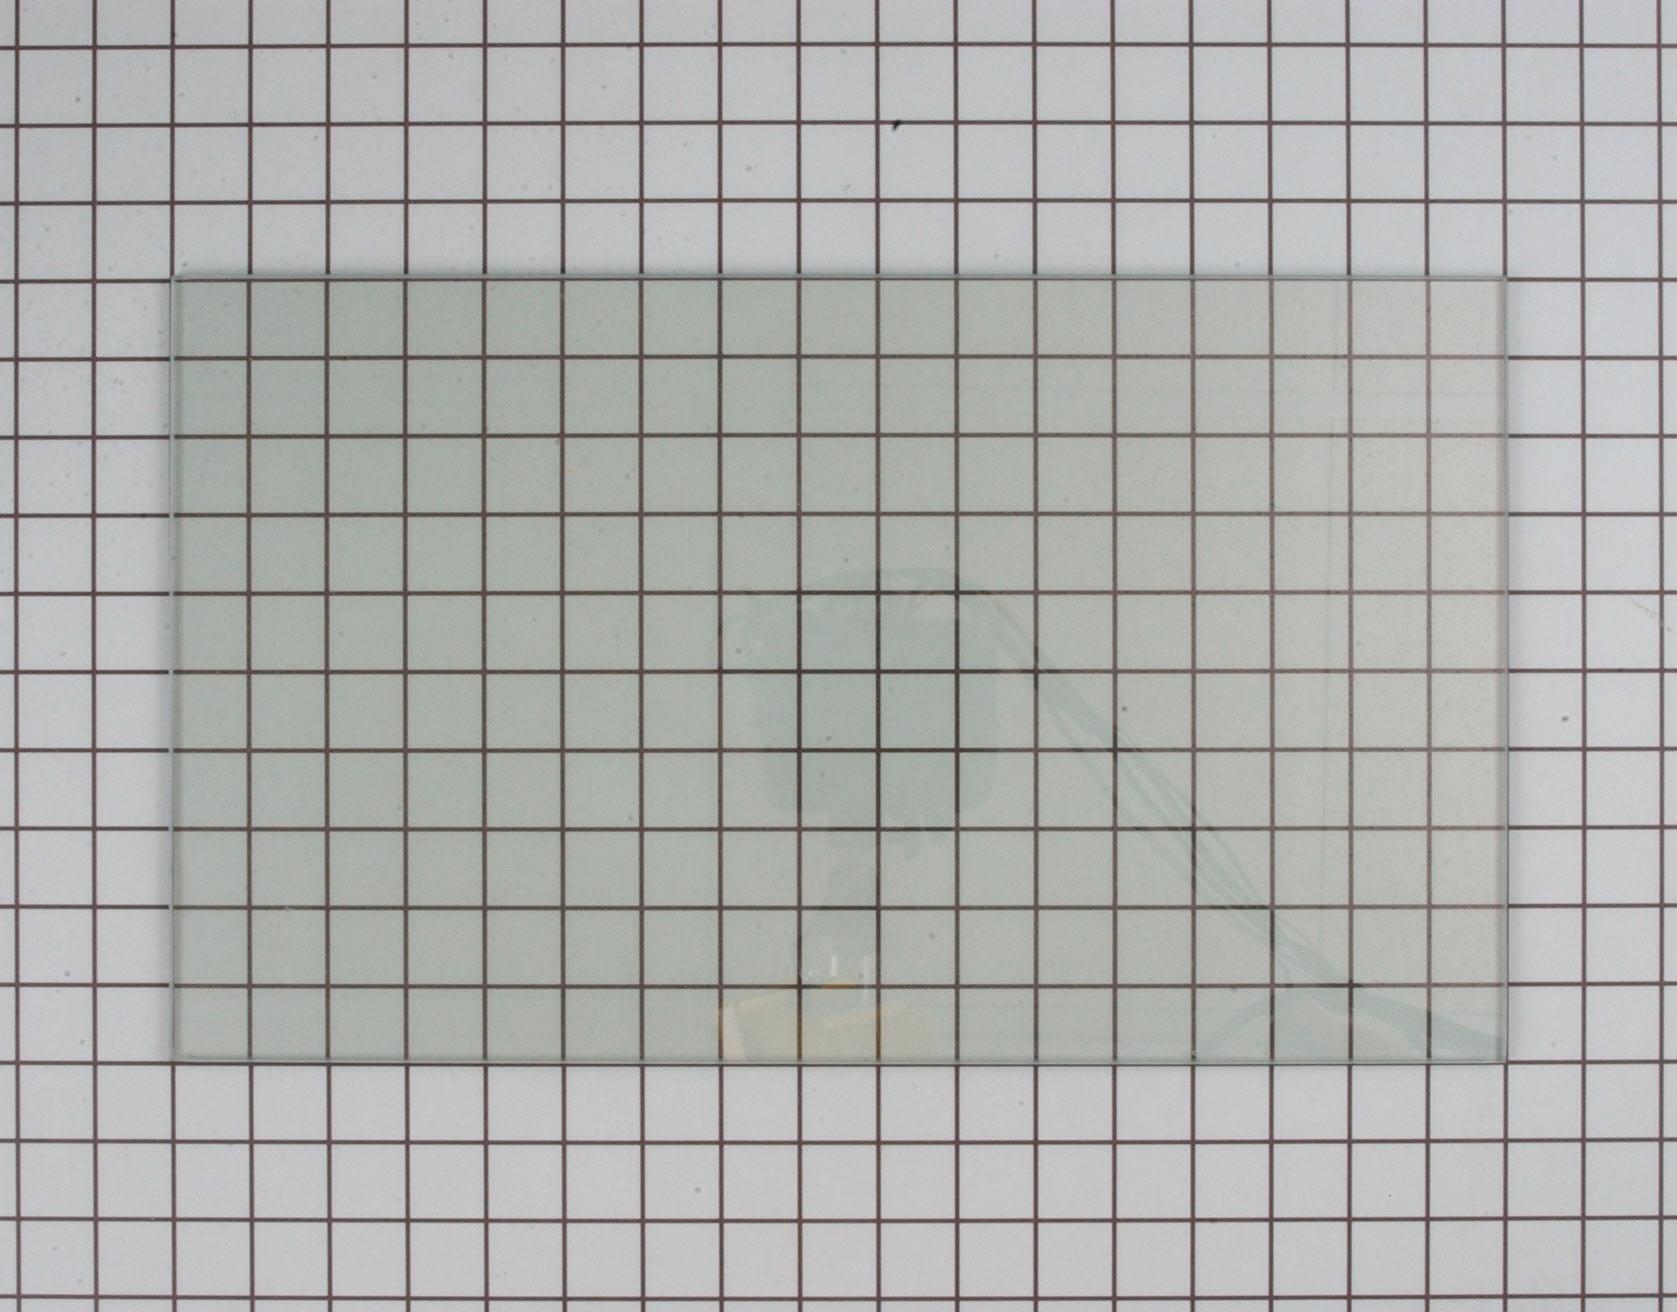 Whirlpool Range/Stove/Oven Part # WP4449253 - Glass Window